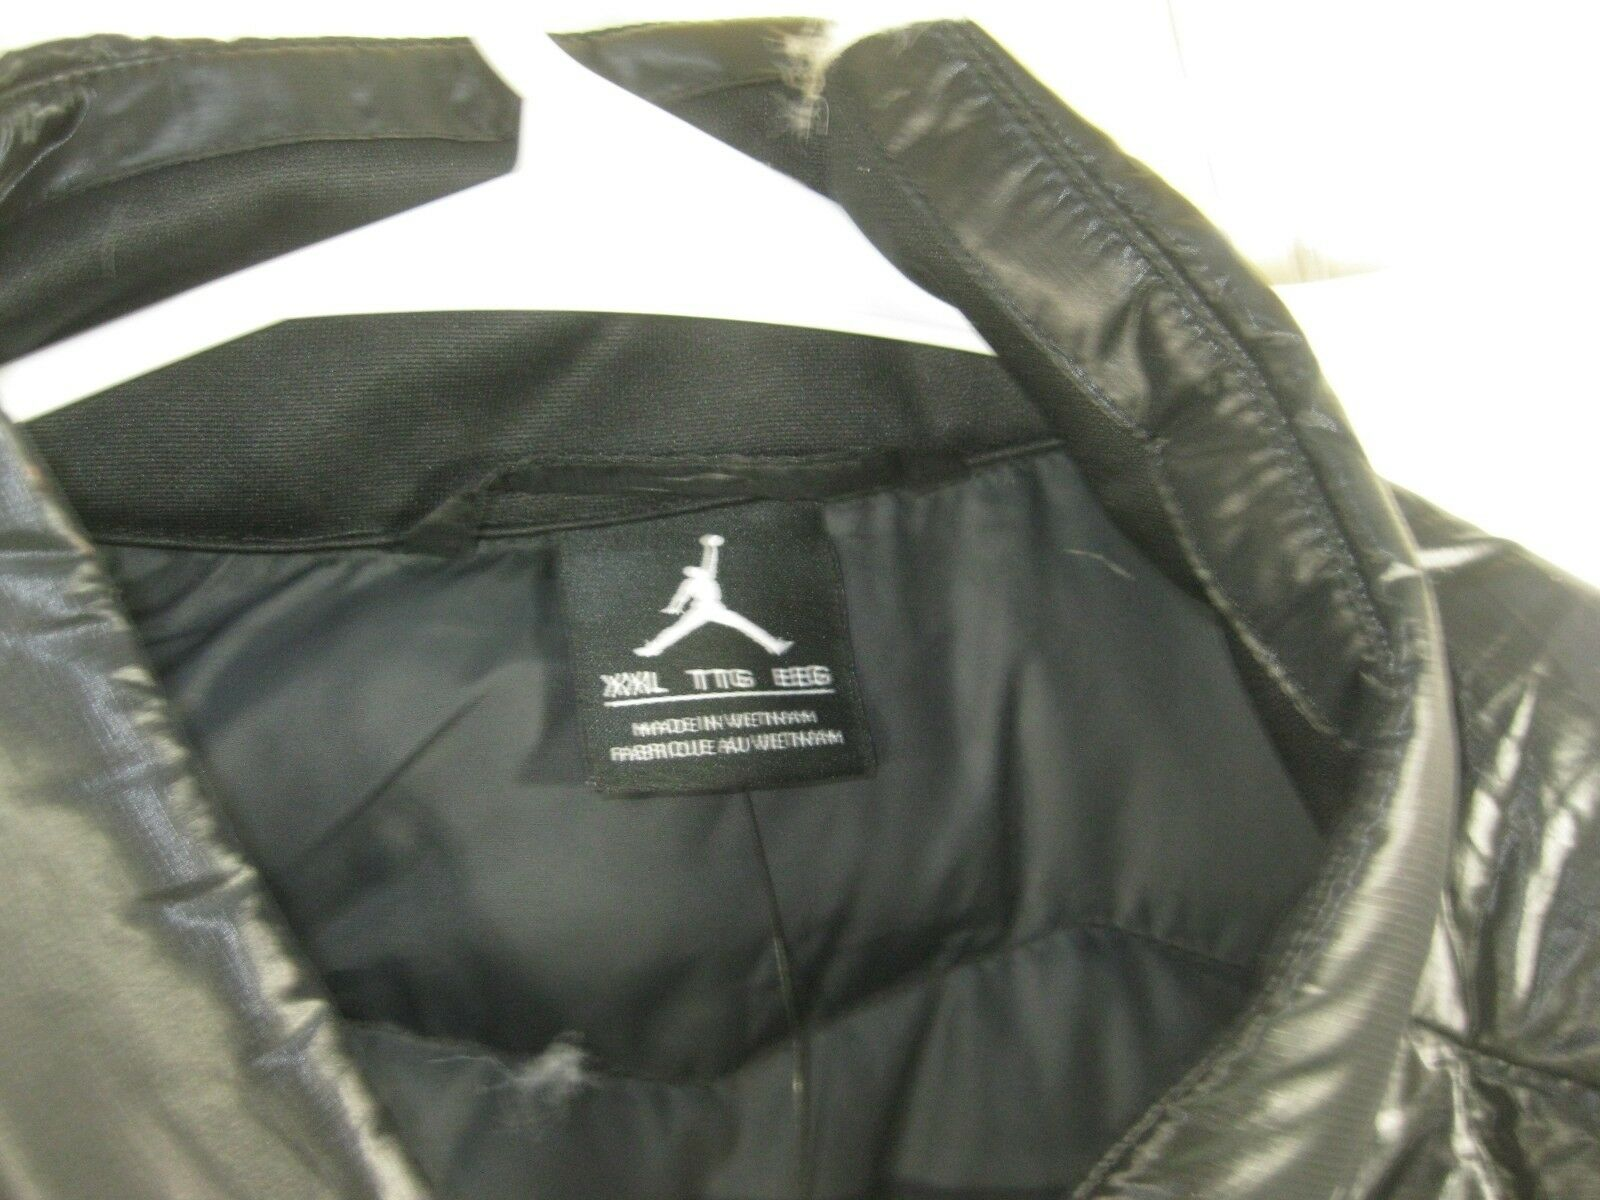 7afcad07f43f Mens XXL 2xl Nike Air Jordan Hybrid Down Puffer Vest Jacket Coat ...